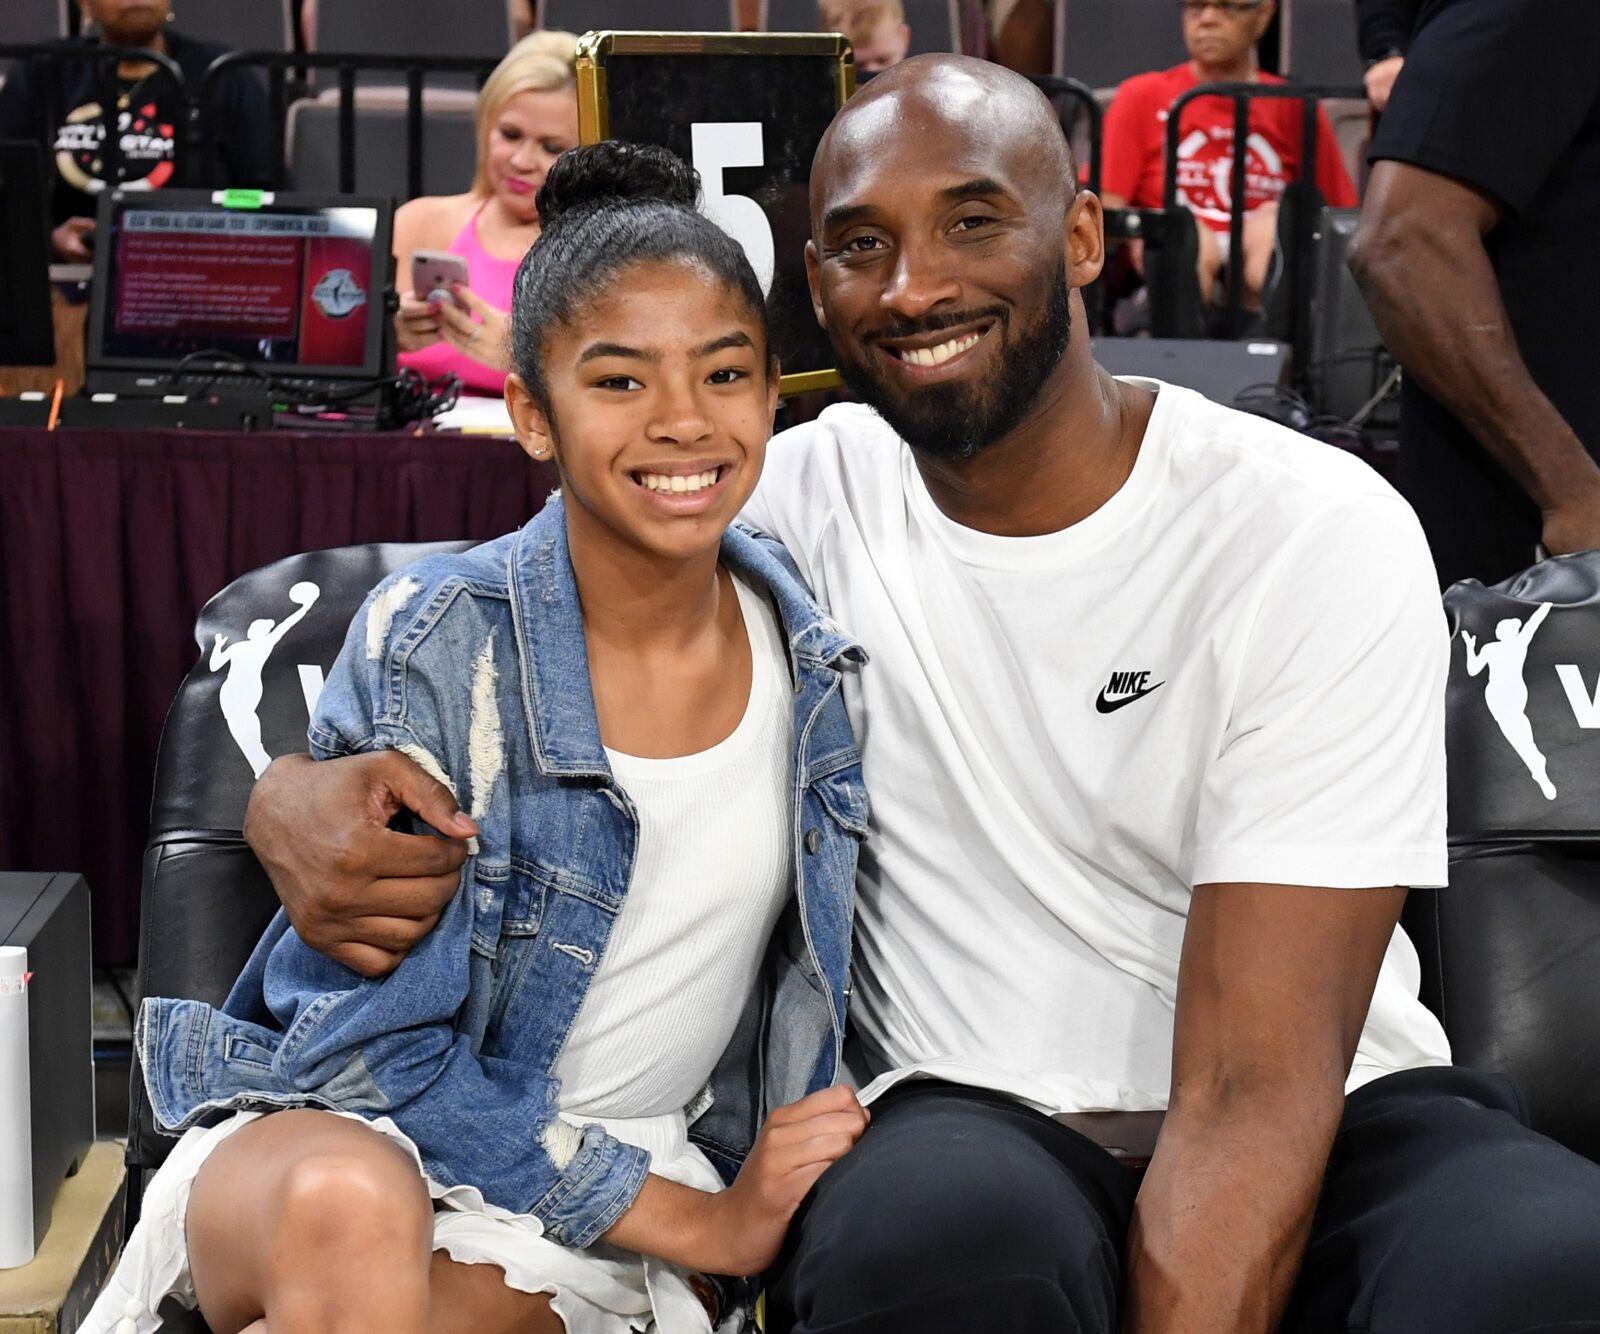 Kobe Bryant's bond with future Louisville basketball star went beyond hoops